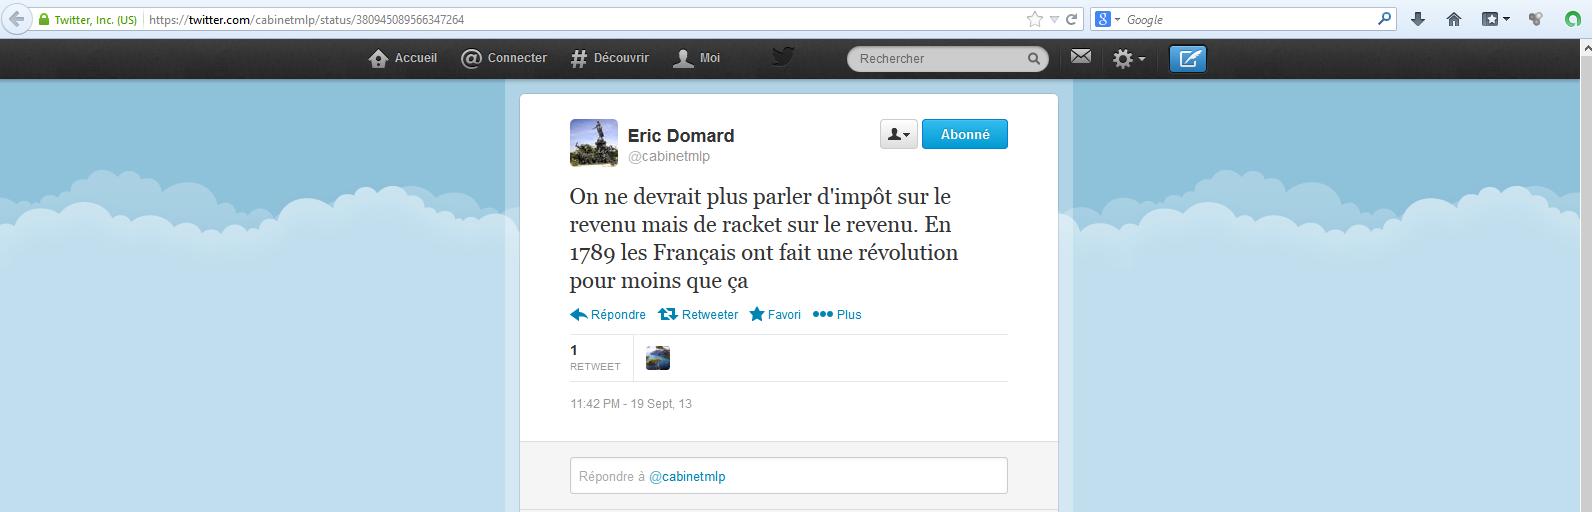 Eric-Domard-19-09-13-Pire-qu-en-1789